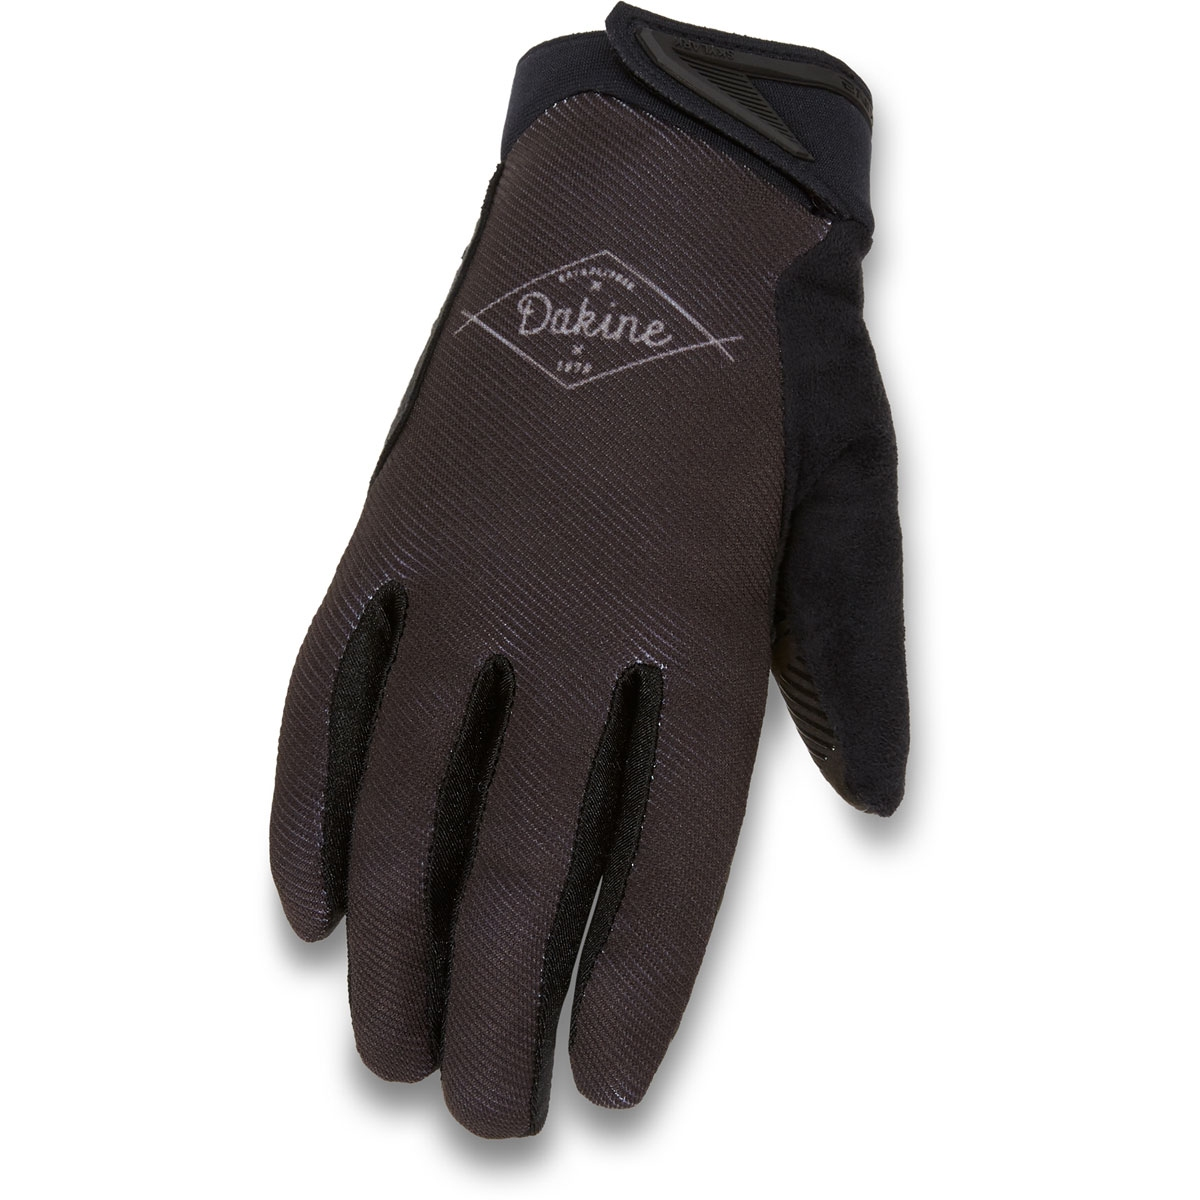 Dakine Woman's Syncline Bike Glove - black